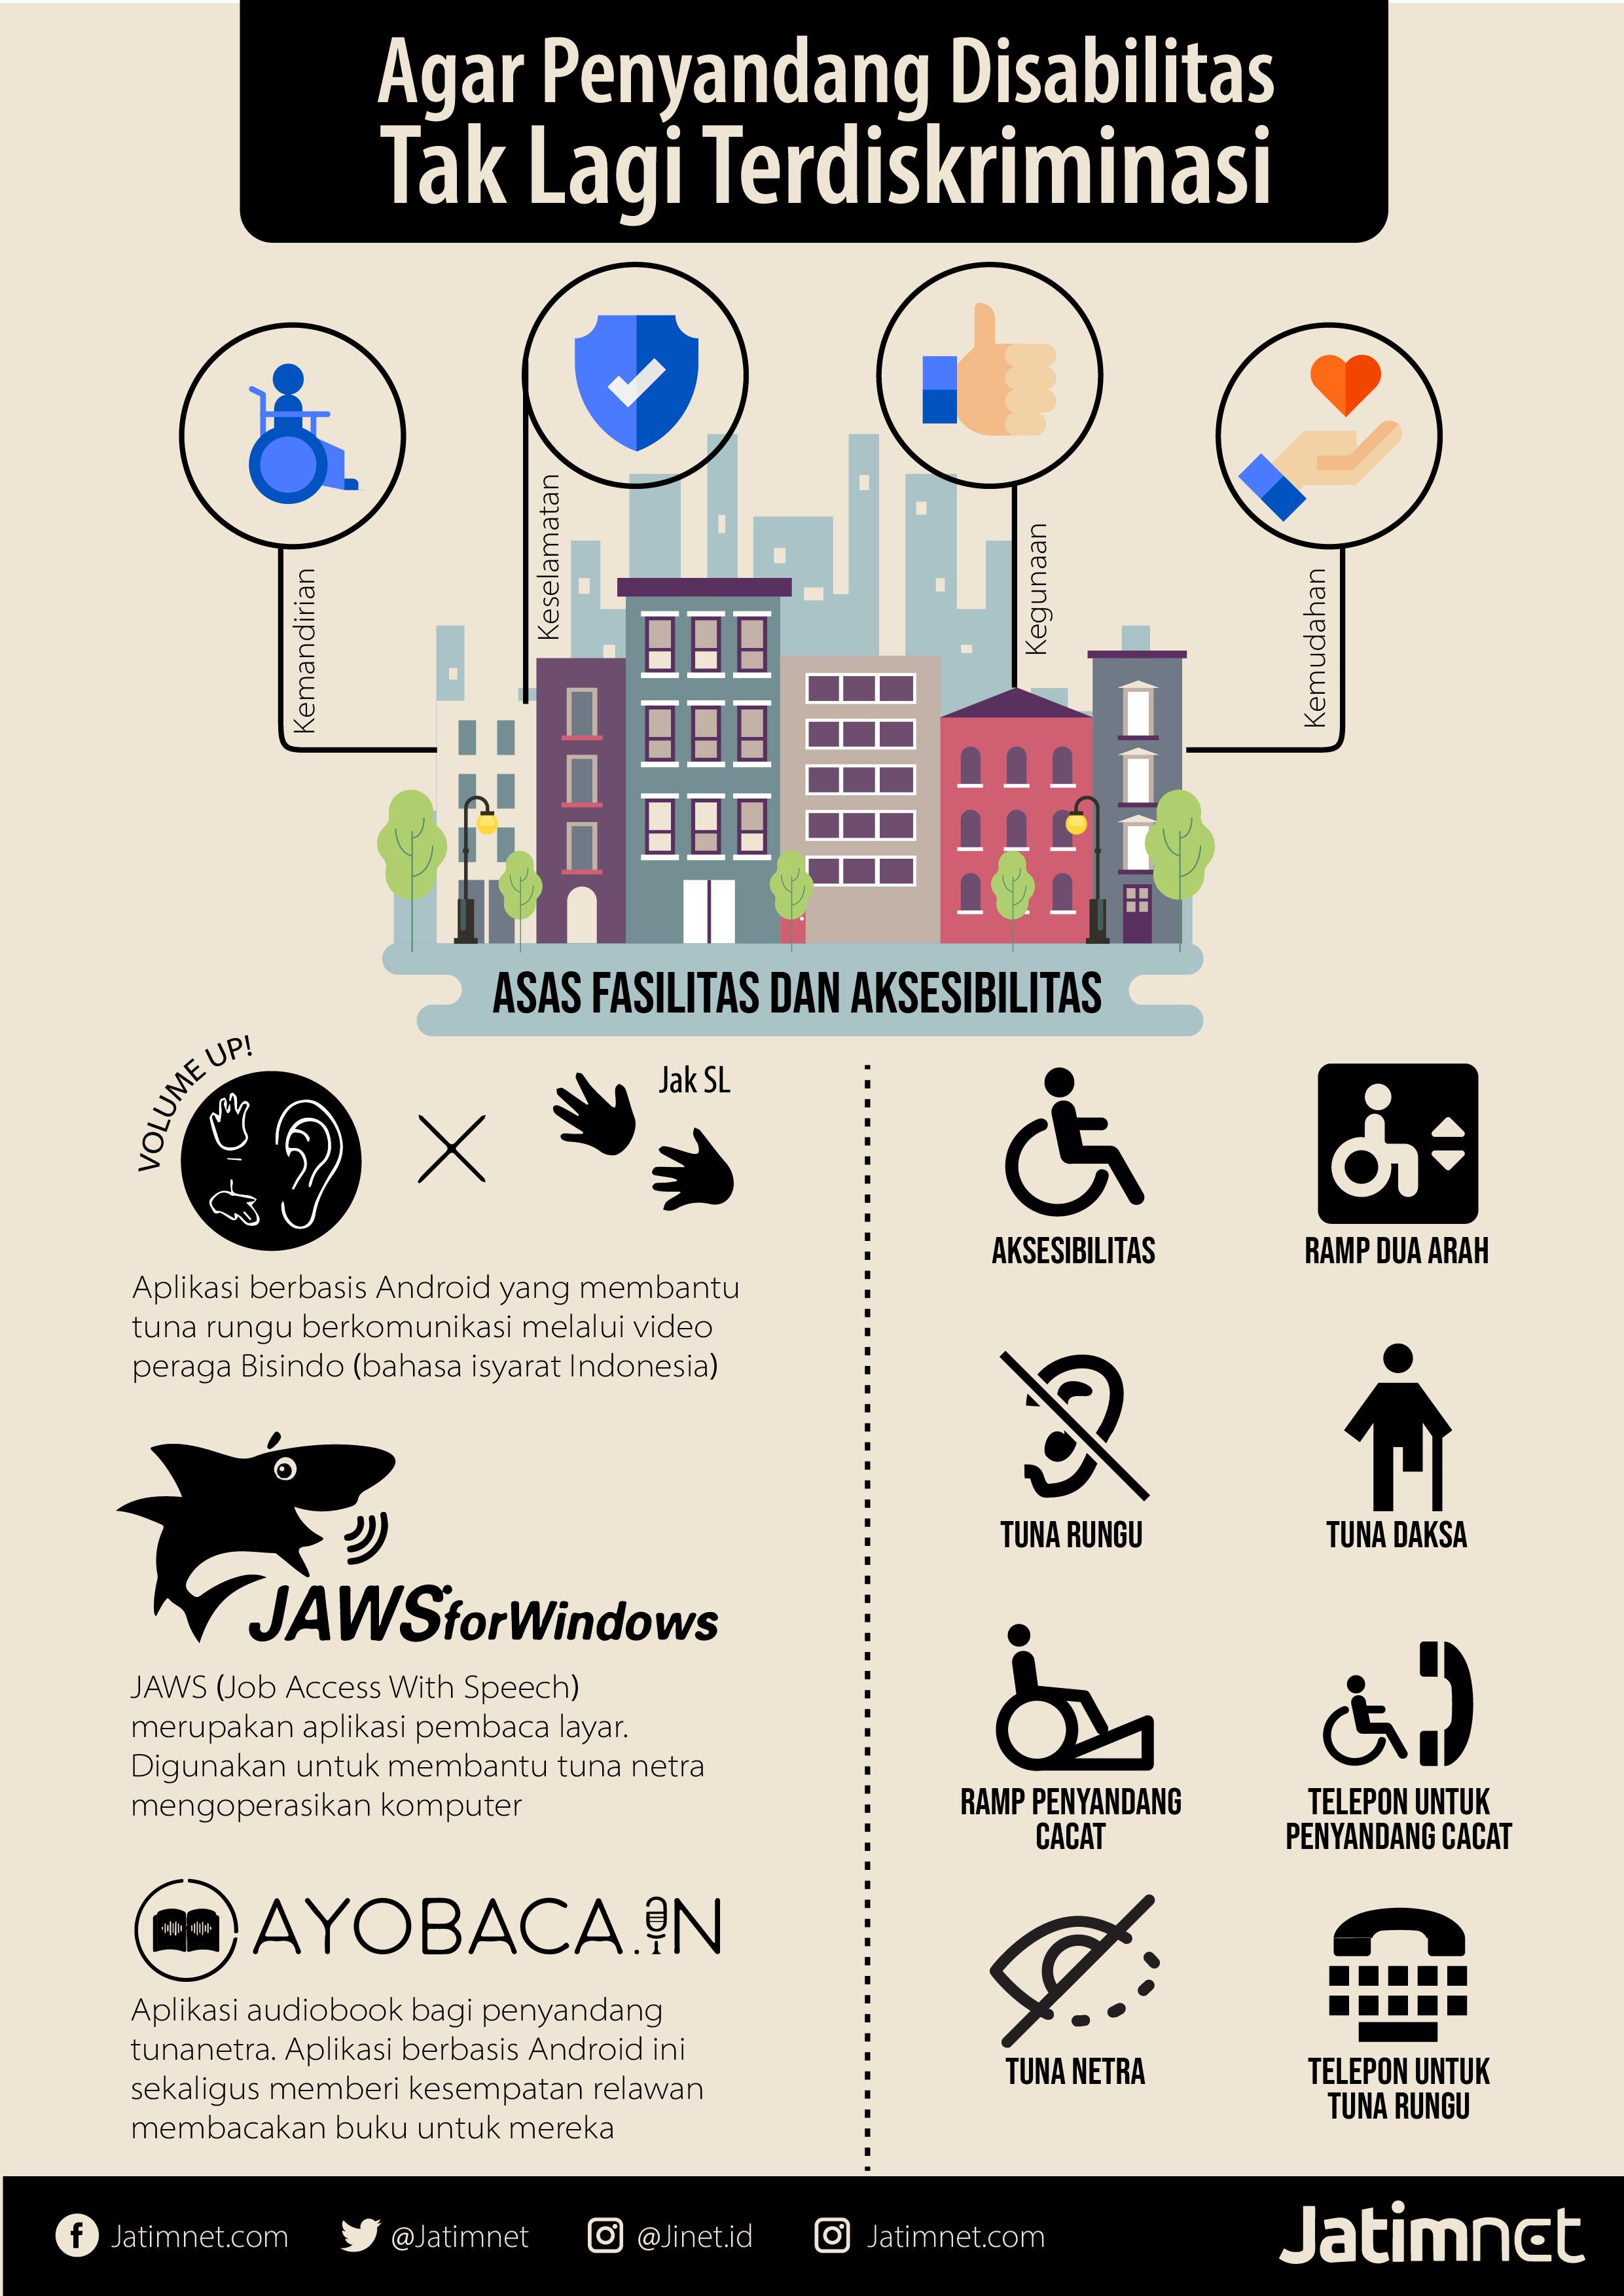 Setop Diskriminasi pada Penyandang Disabilitas